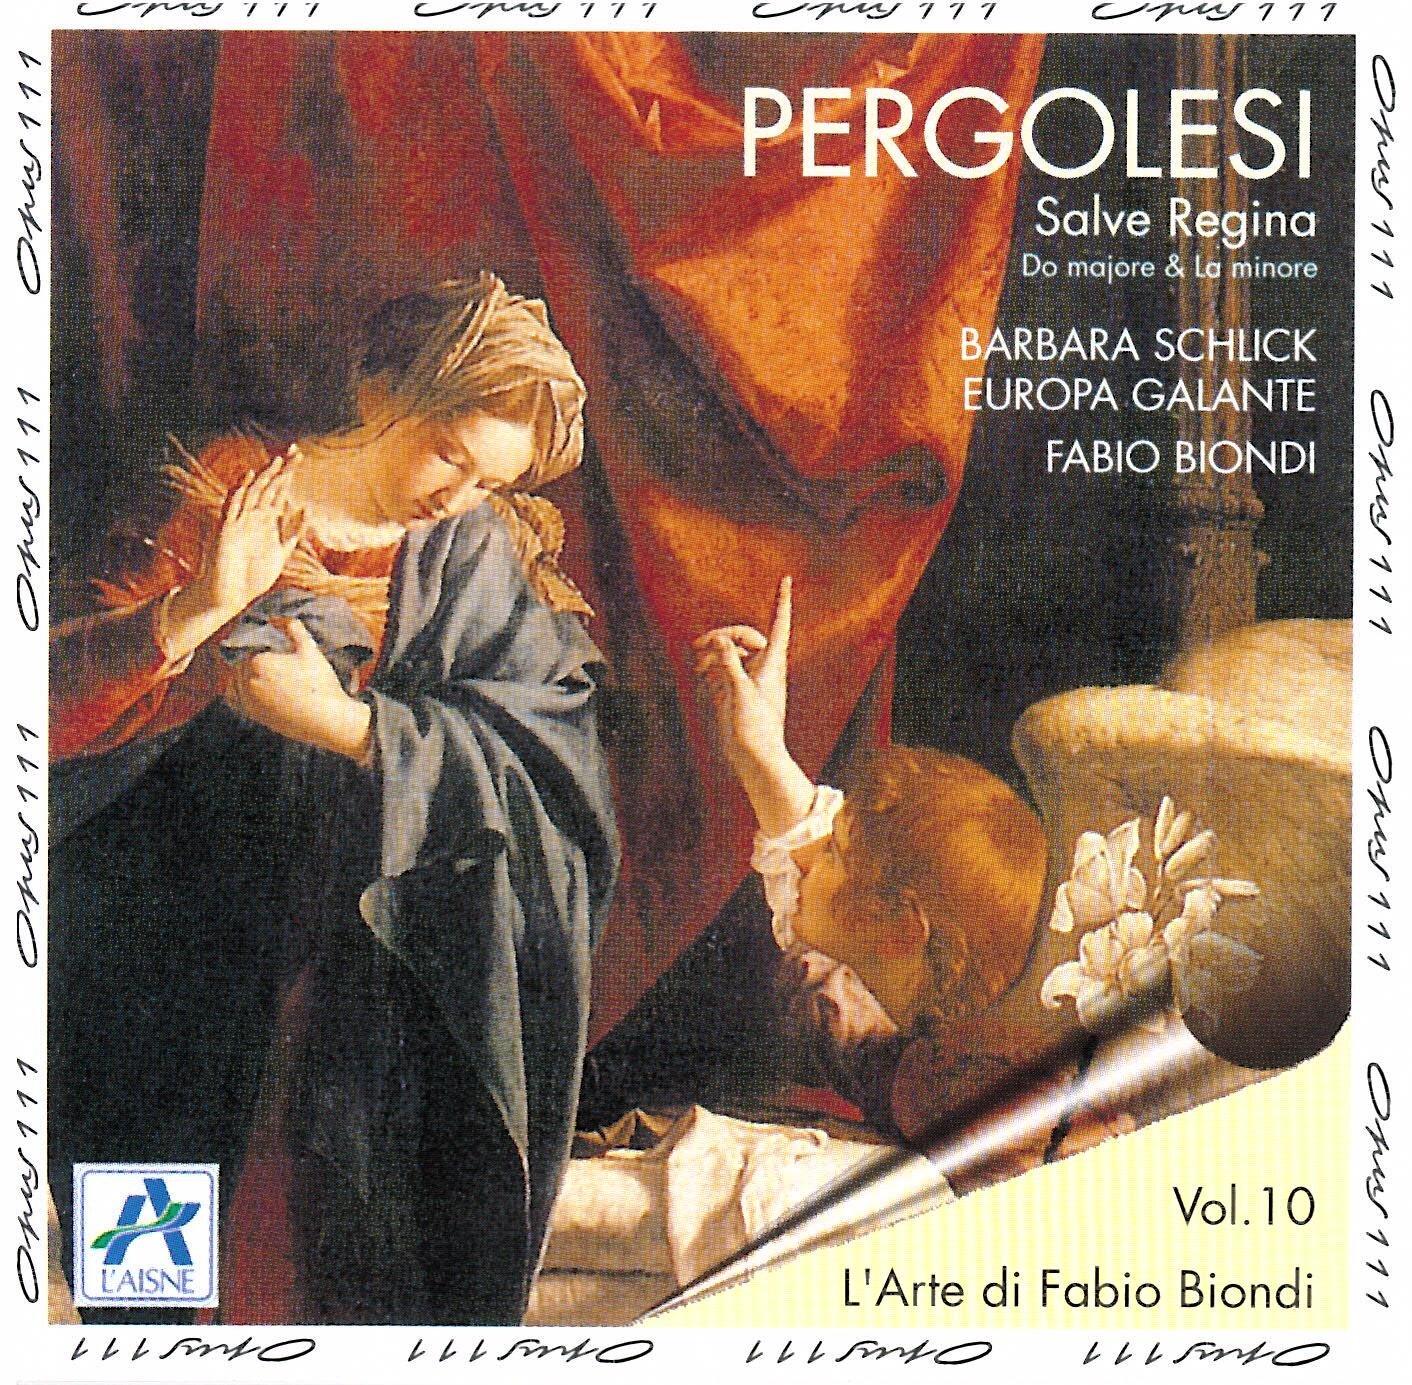 OP3088 Pergolesi Biondi LR.jpg